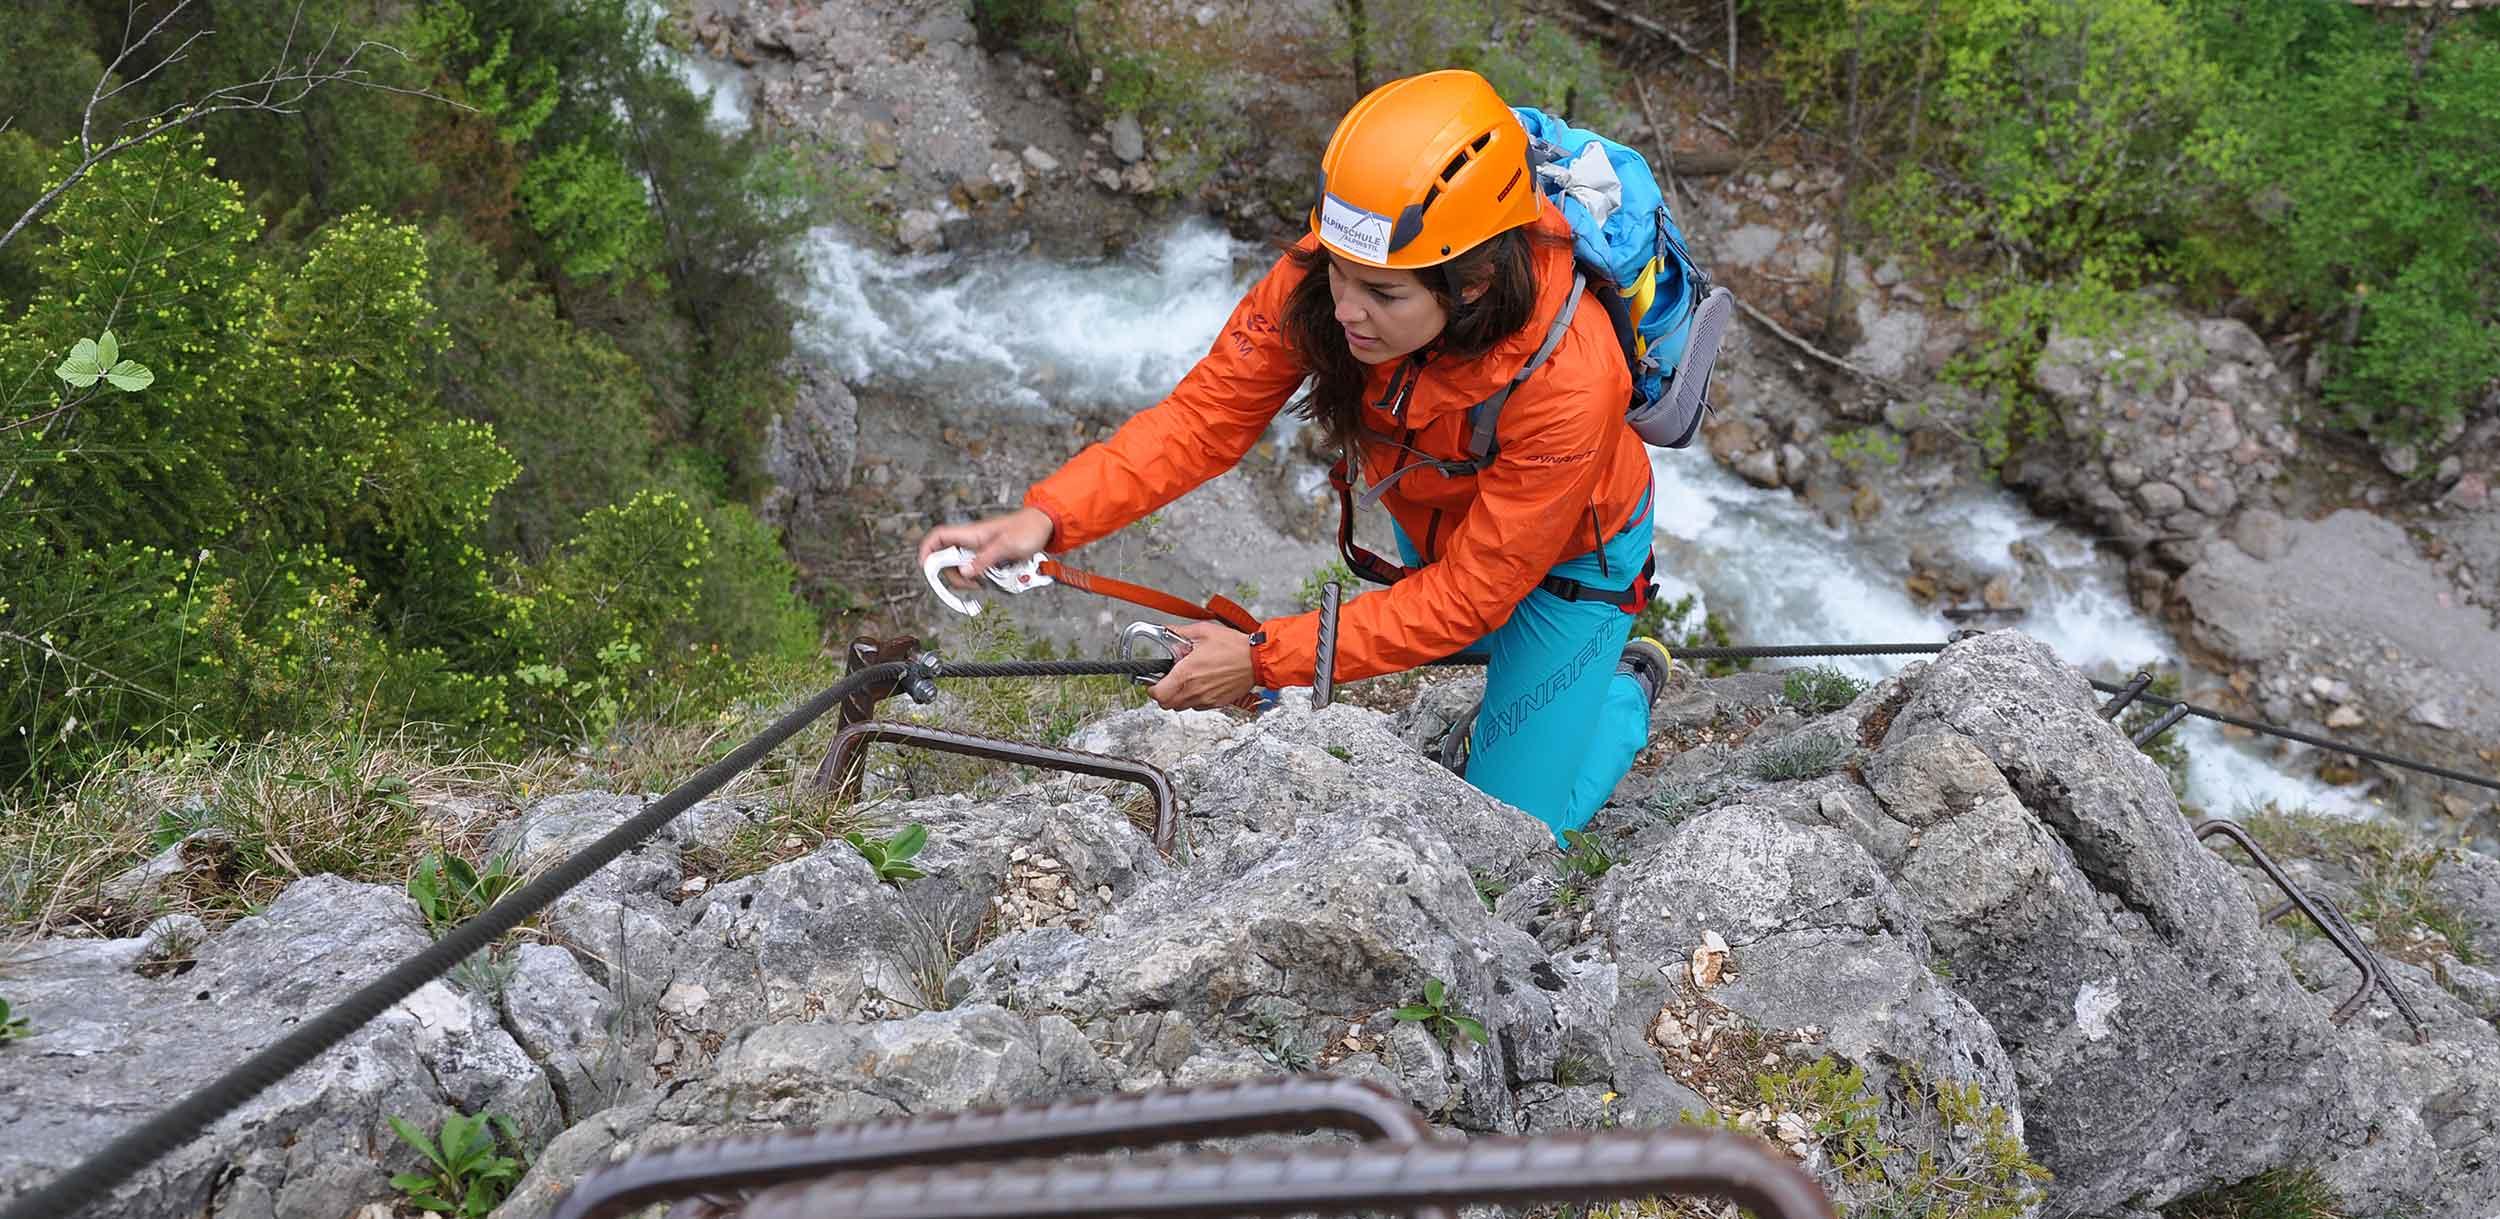 Klettersteigkurse